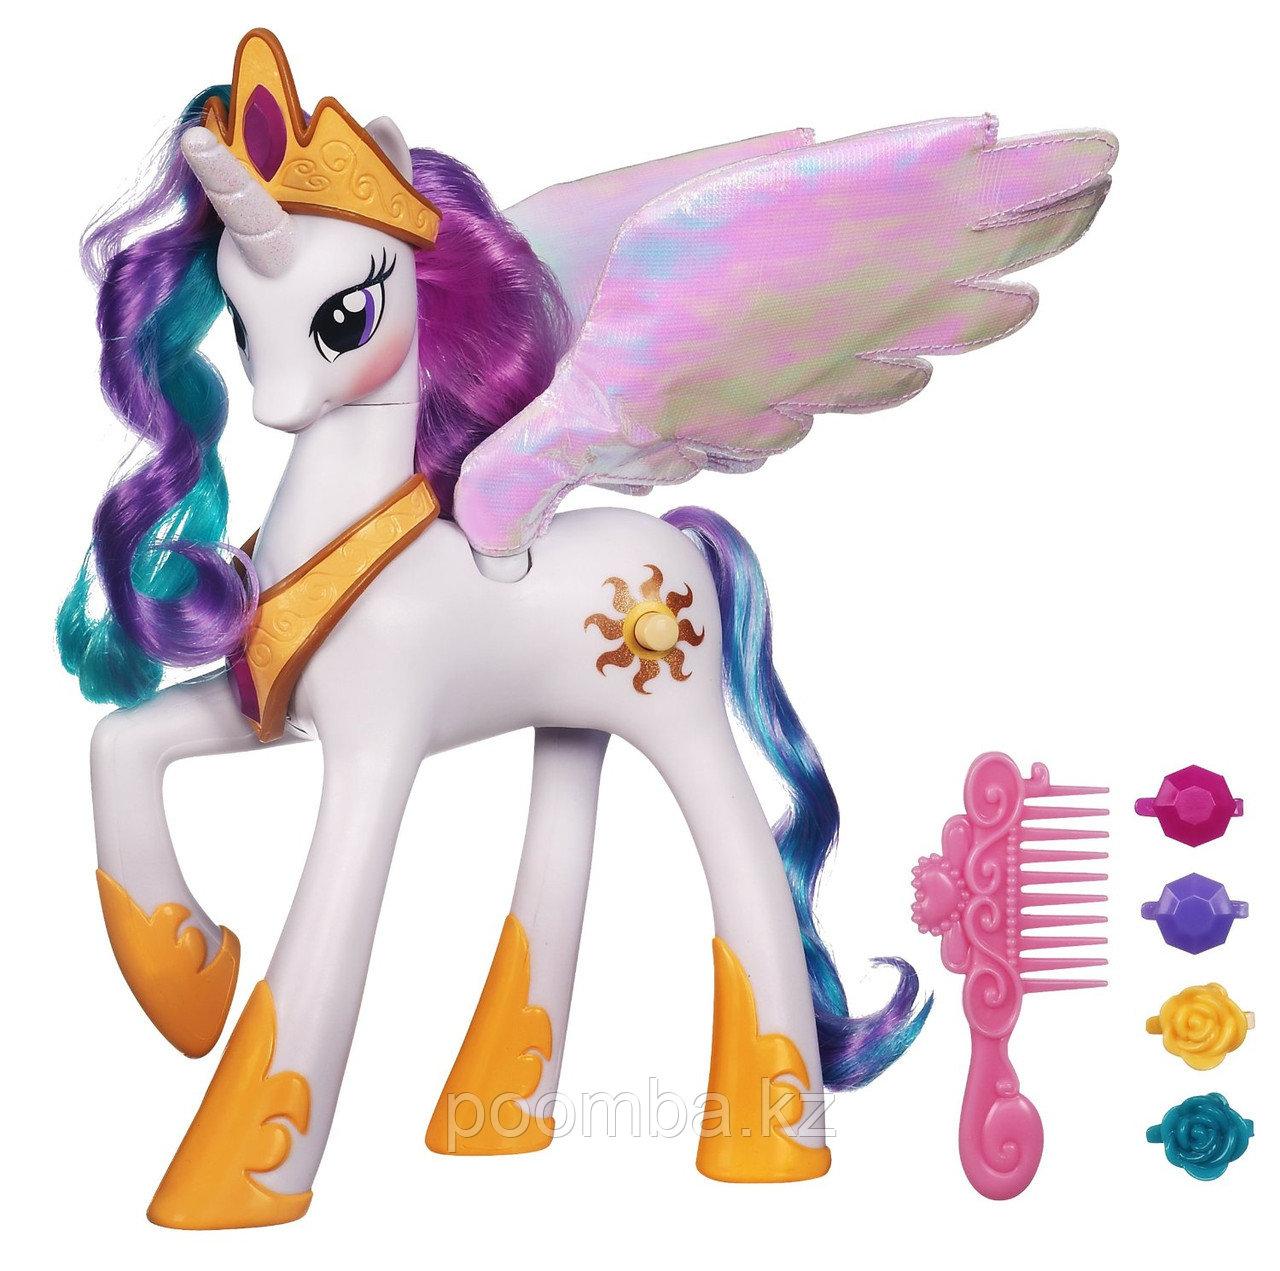 My Little Pony - Принцесса Селестия (Collector Series)